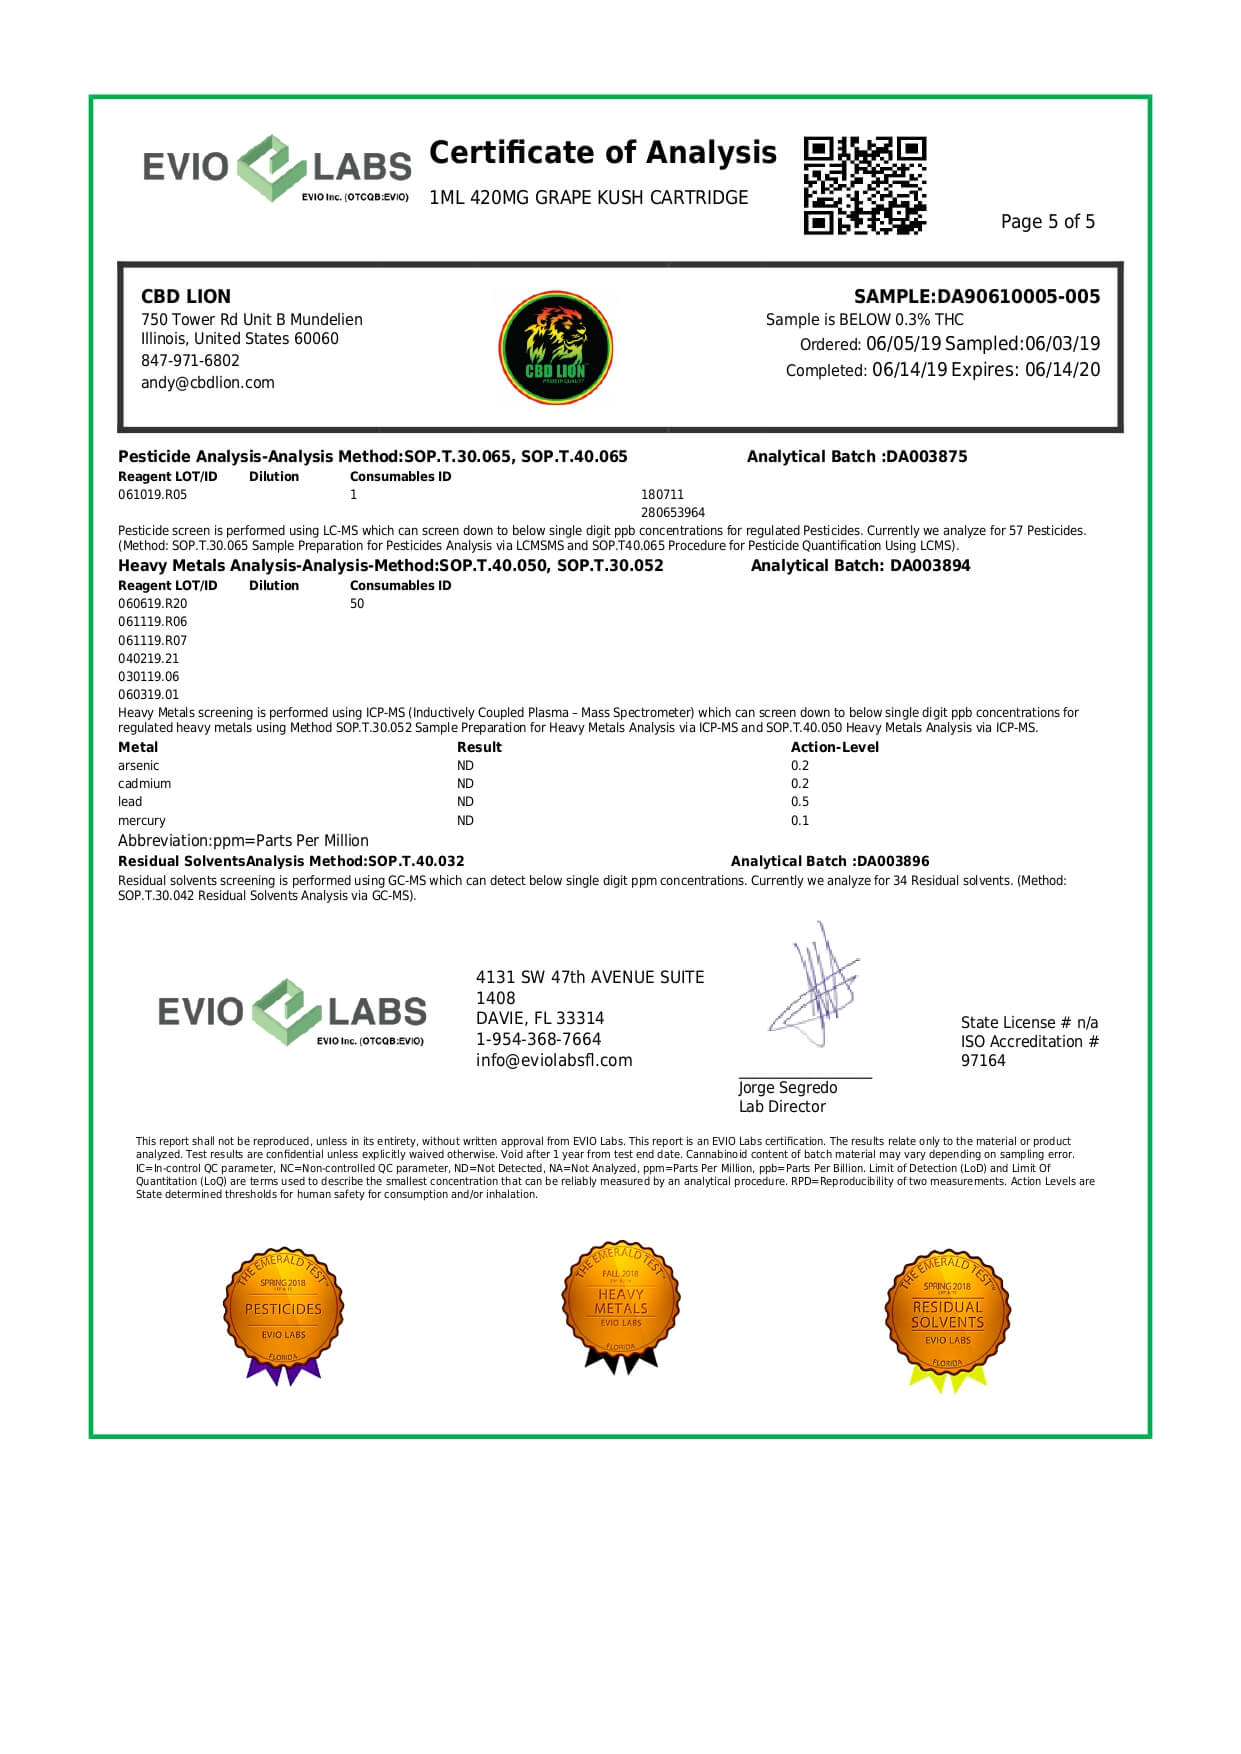 CBD Lion CBD Cartridge Grape Kush 420mg Lab Report